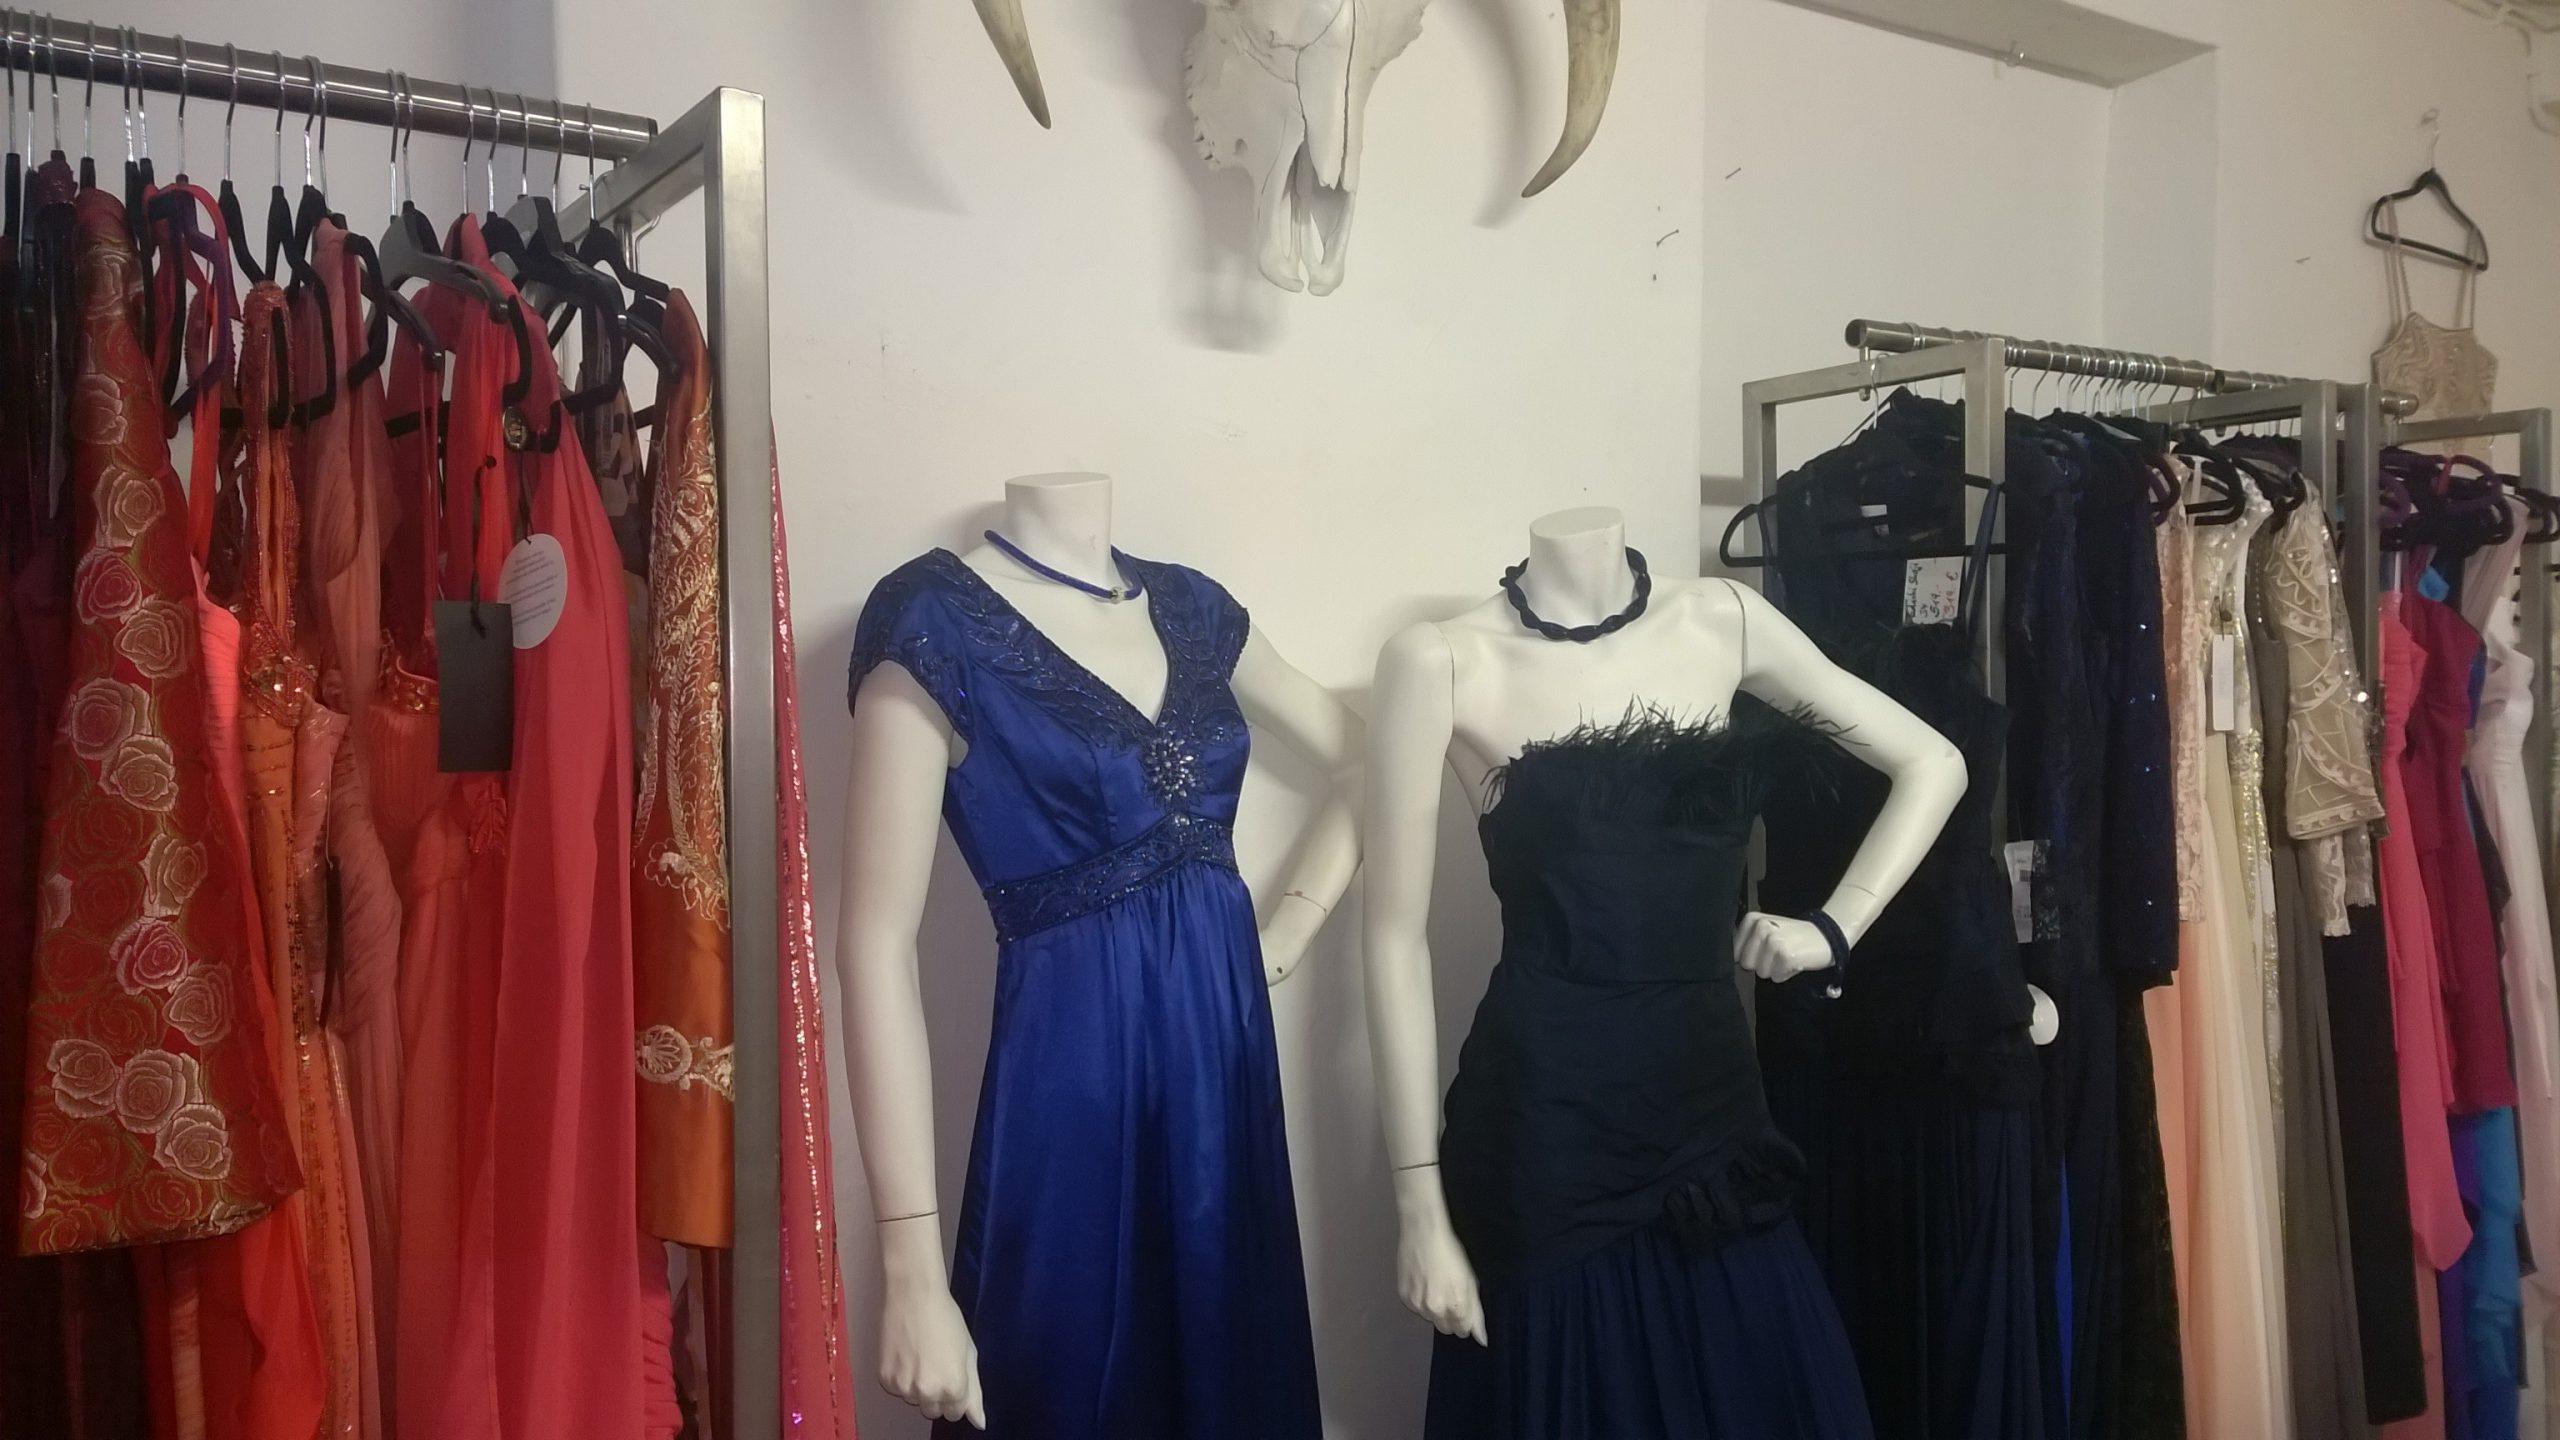 17 Perfekt Abendkleid Outlet ÄrmelFormal Elegant Abendkleid Outlet Spezialgebiet